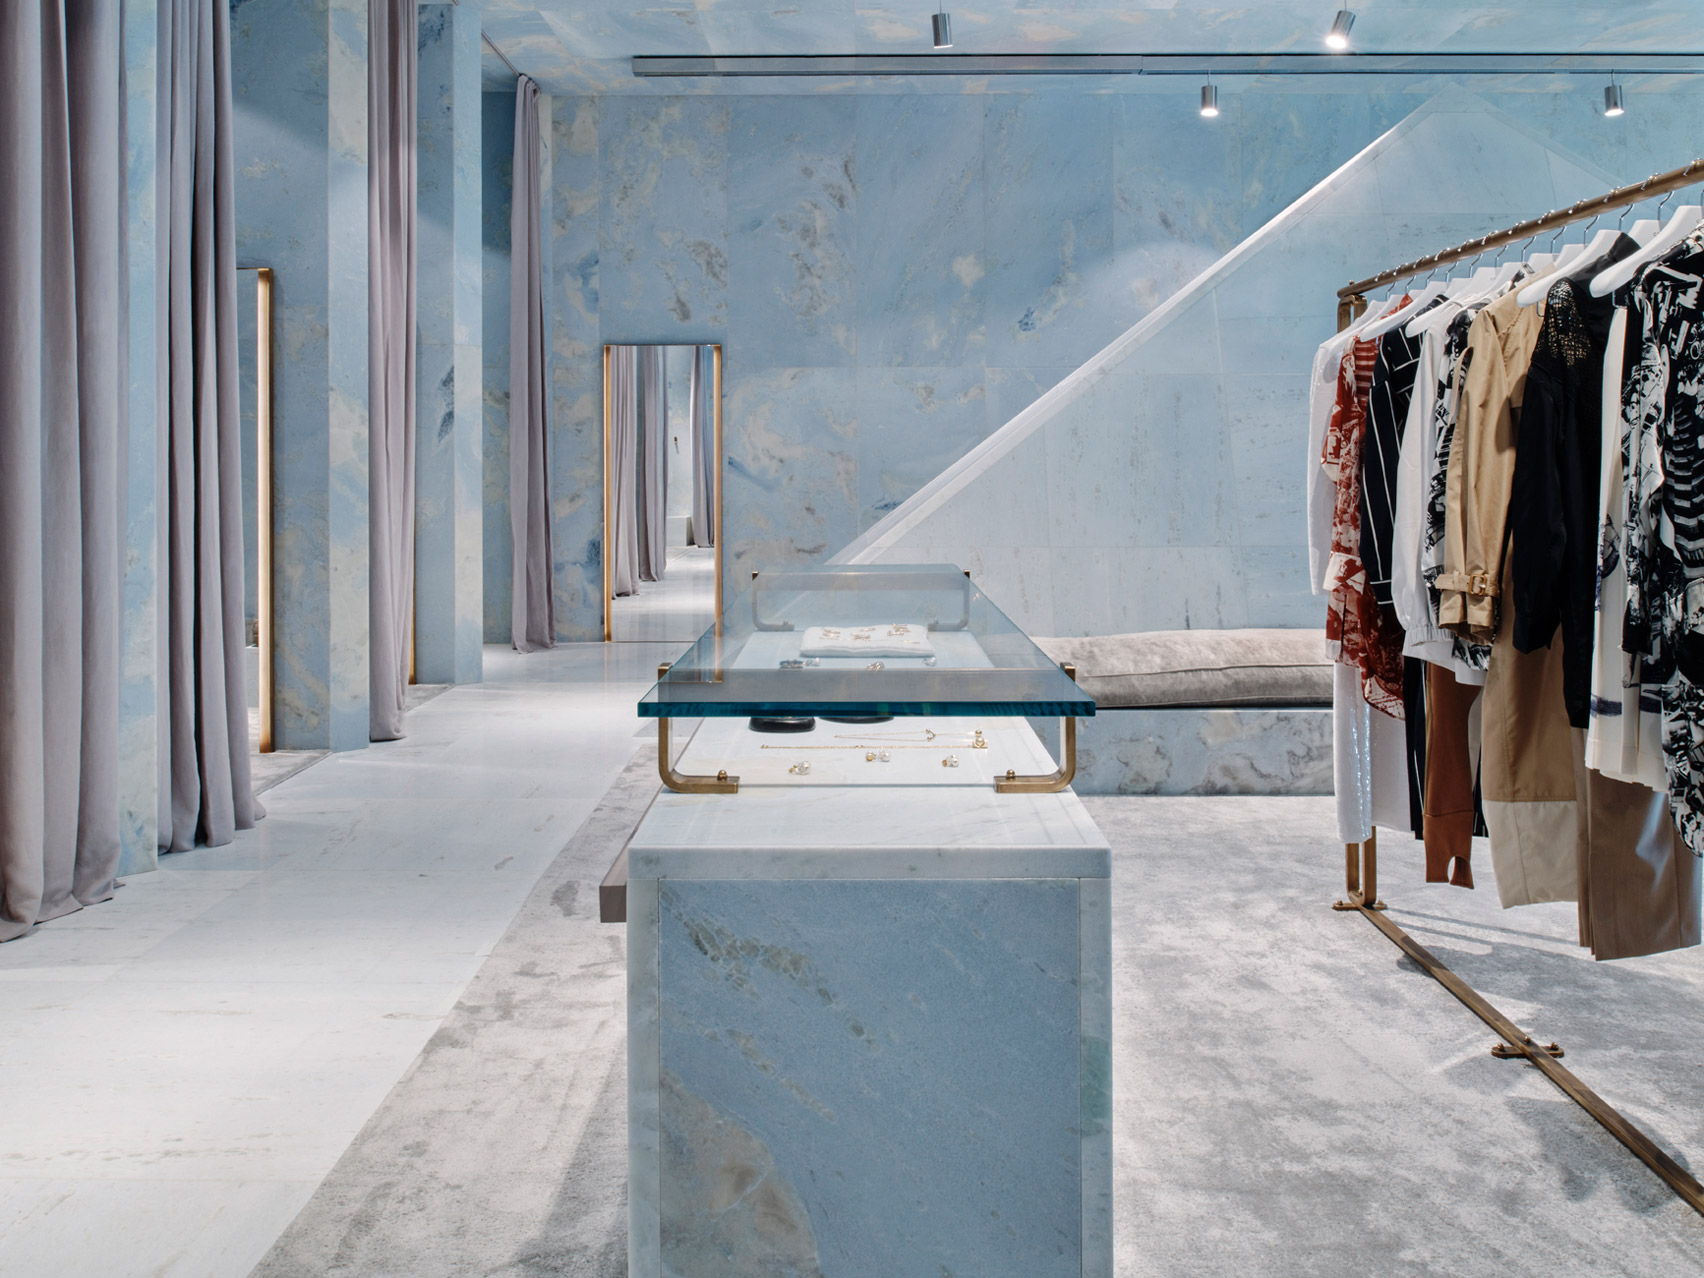 celine-valerio-olgiati-interiors-retail-shops-marble-miami-florida-usa-_dezeen_1704_col_9